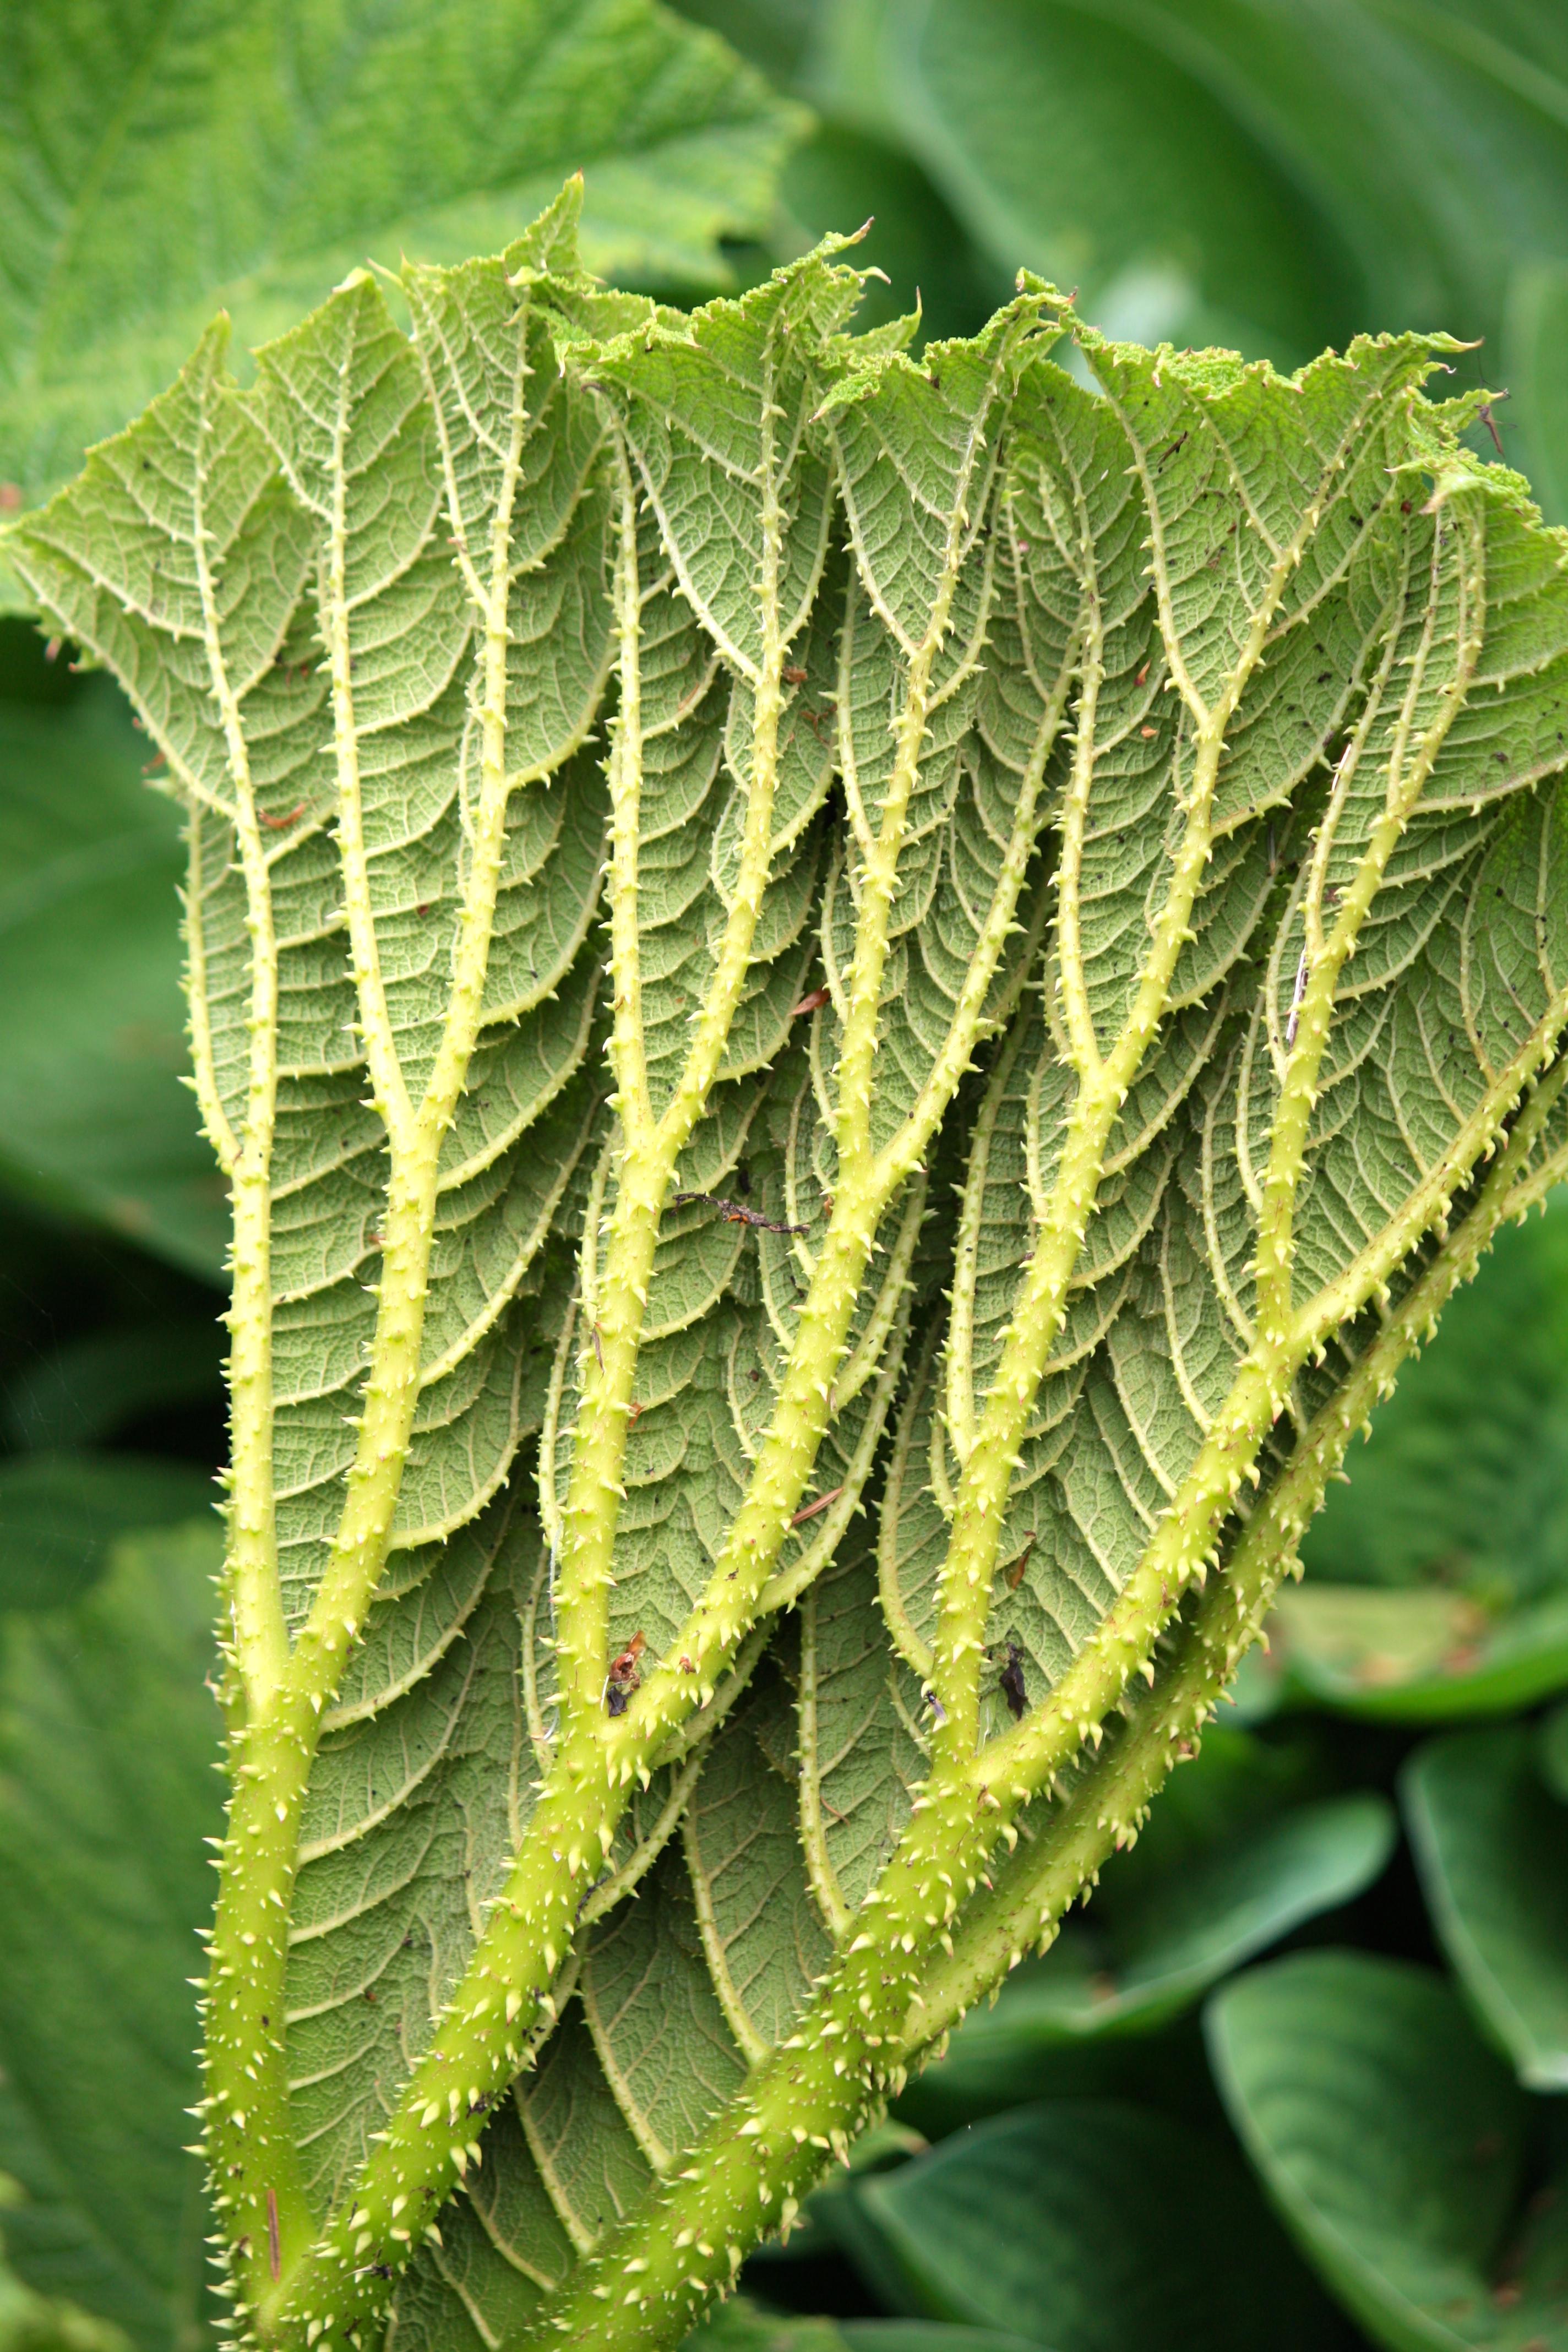 Brazilian Giant-Rhubarb - Gunnera manicata Leaves 7